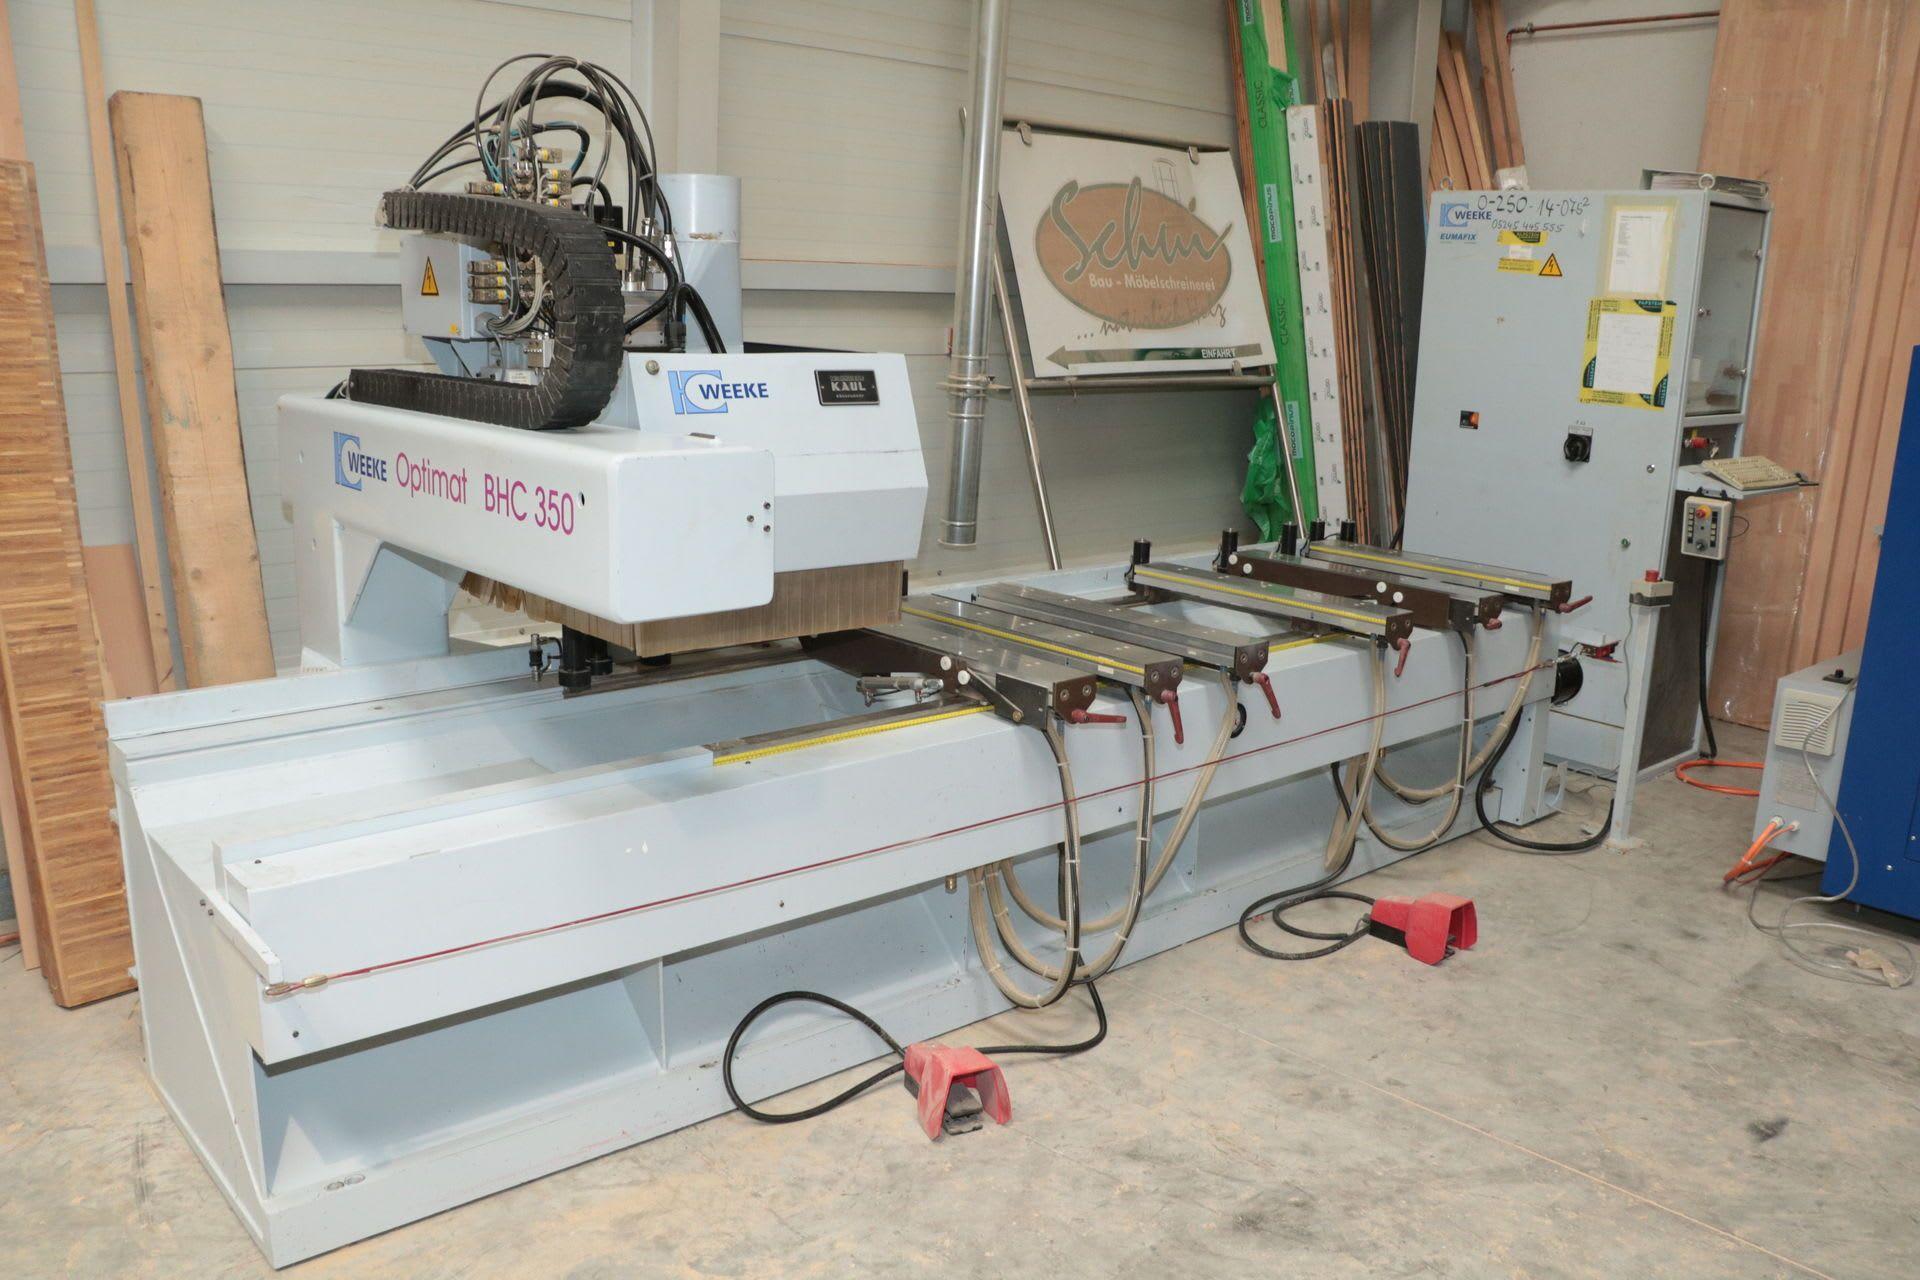 WEEKE Optimat BHC 350 CNC-Bearbeitungszentrum